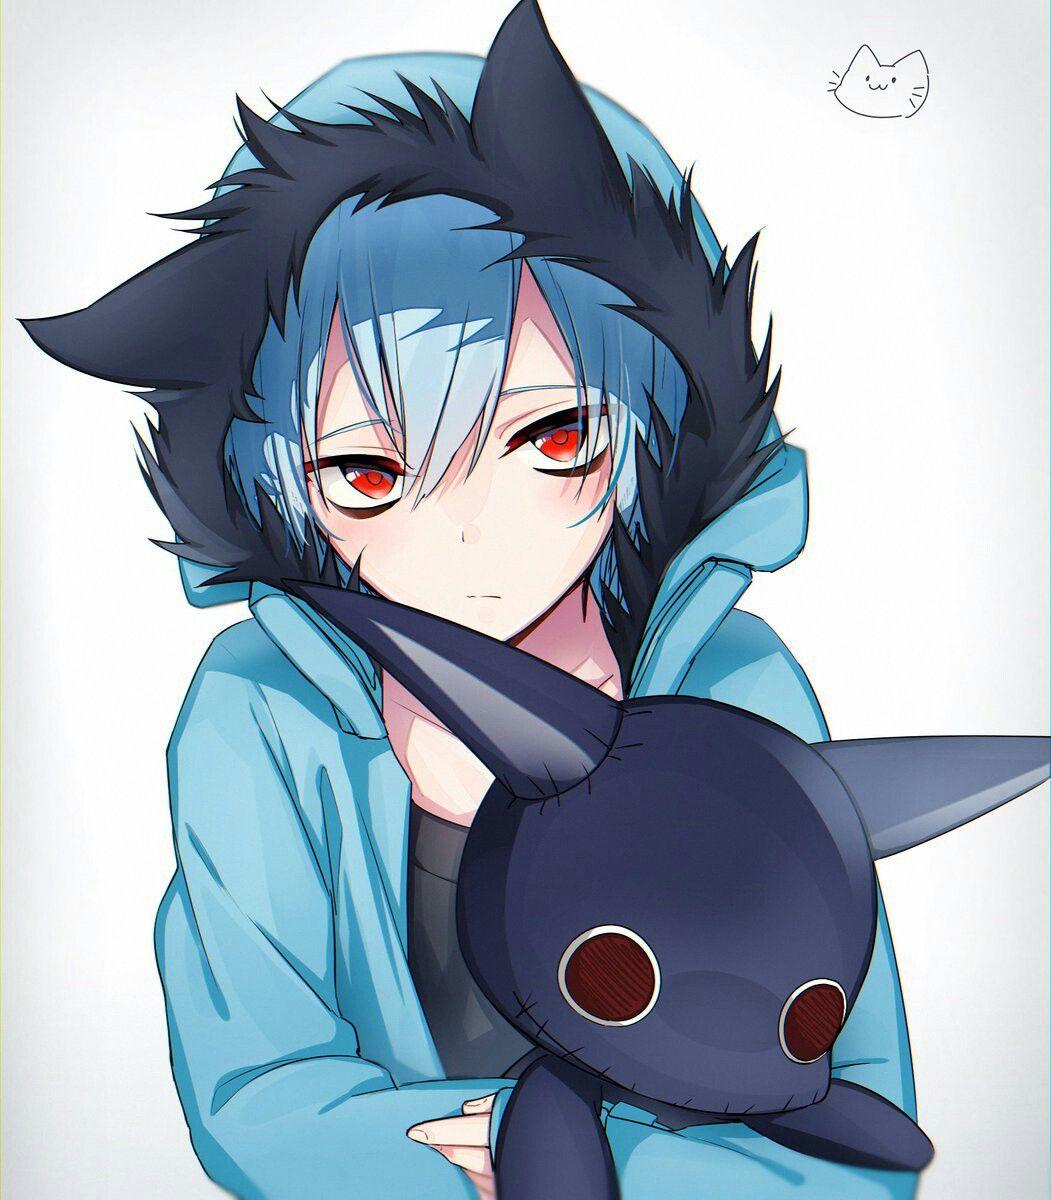 Animeboys sleepyash anime http anime redsom com anime boys kuro sleepy ash servamp kuro sleepy ash servamppic twitter com kxb1qqge3t